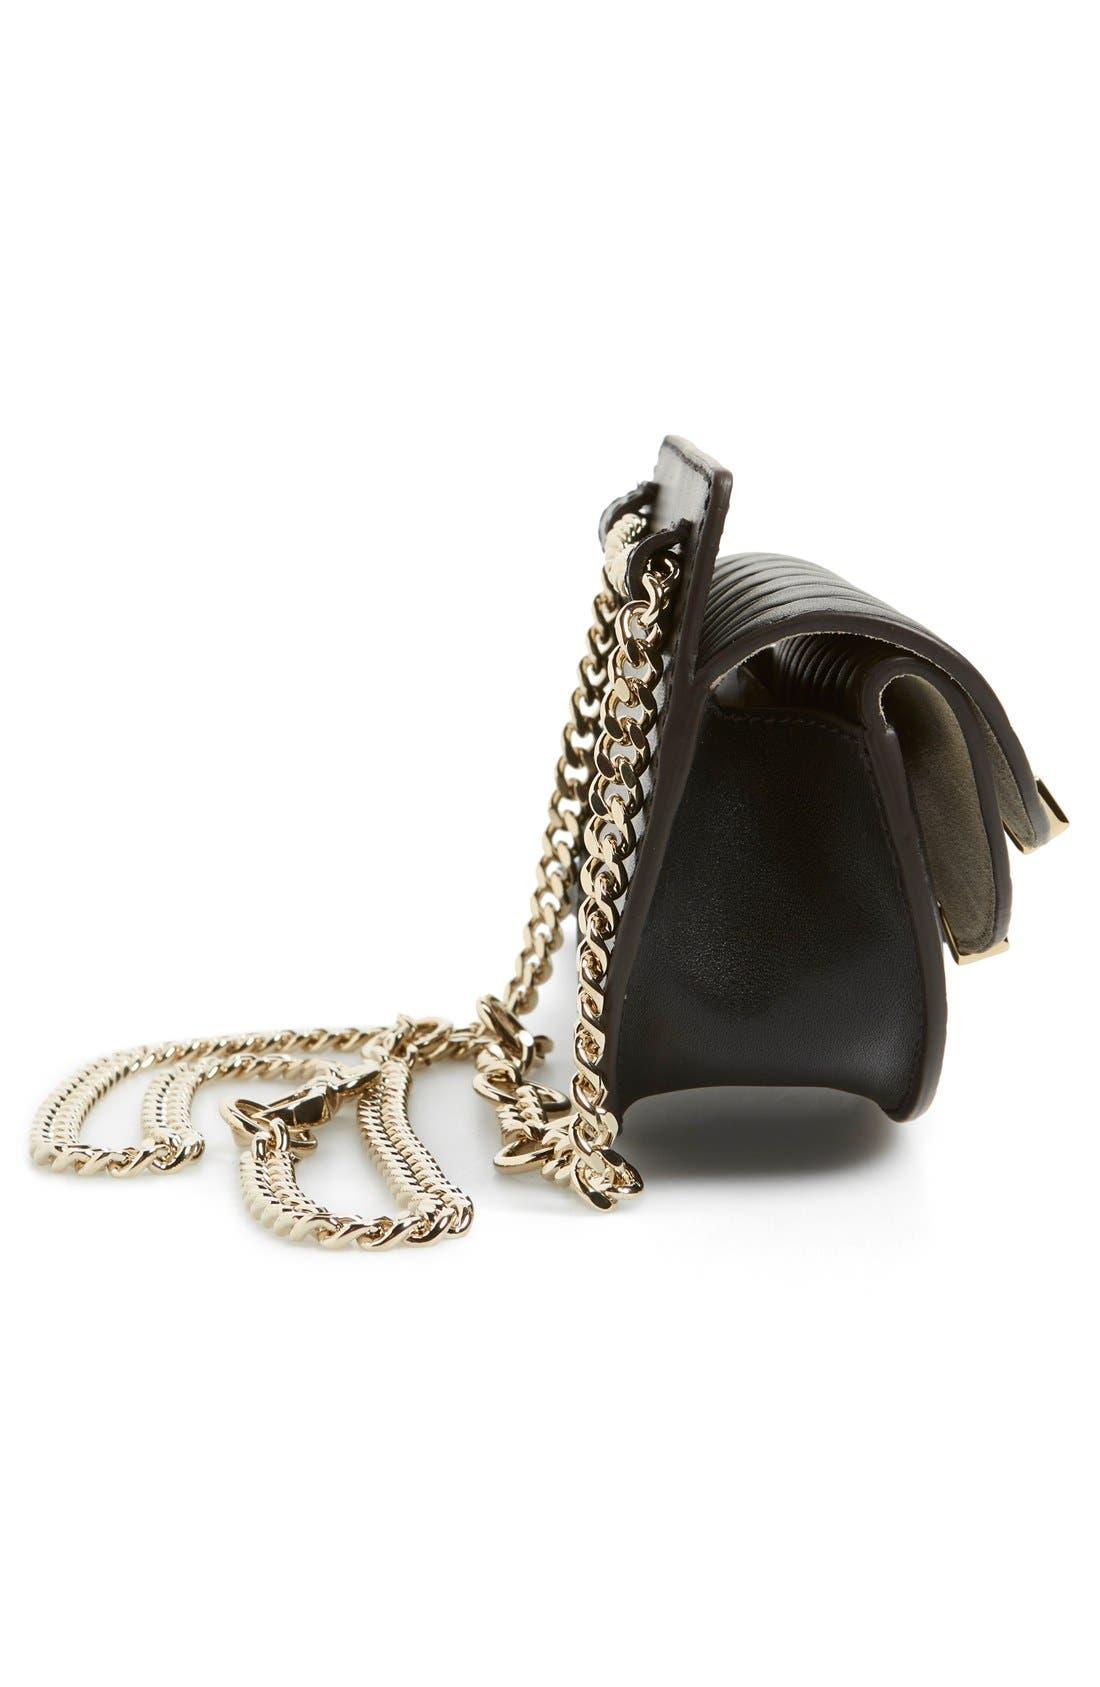 'Nano Georgia' Embossed Calfskin Leather Fanny Pack,                             Alternate thumbnail 4, color,                             001